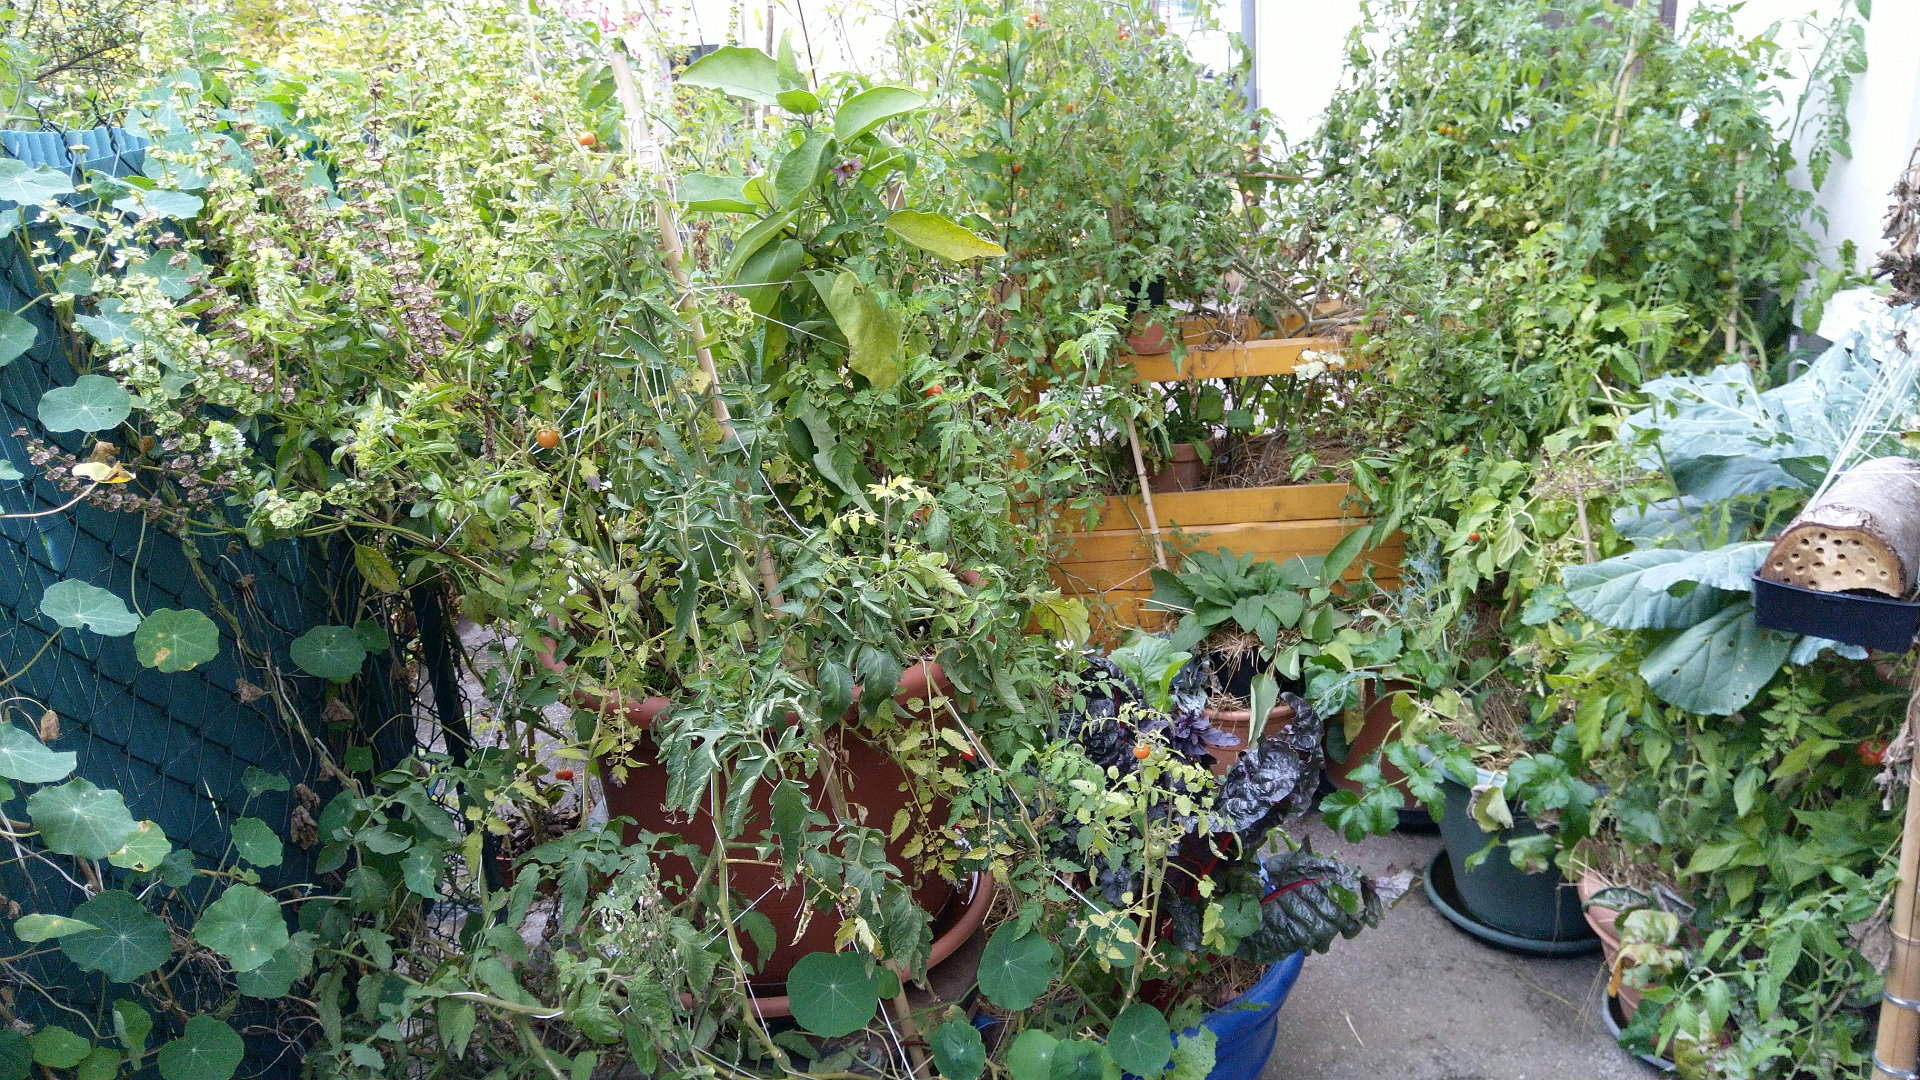 quoi-faire-jardin-automne-permaculture